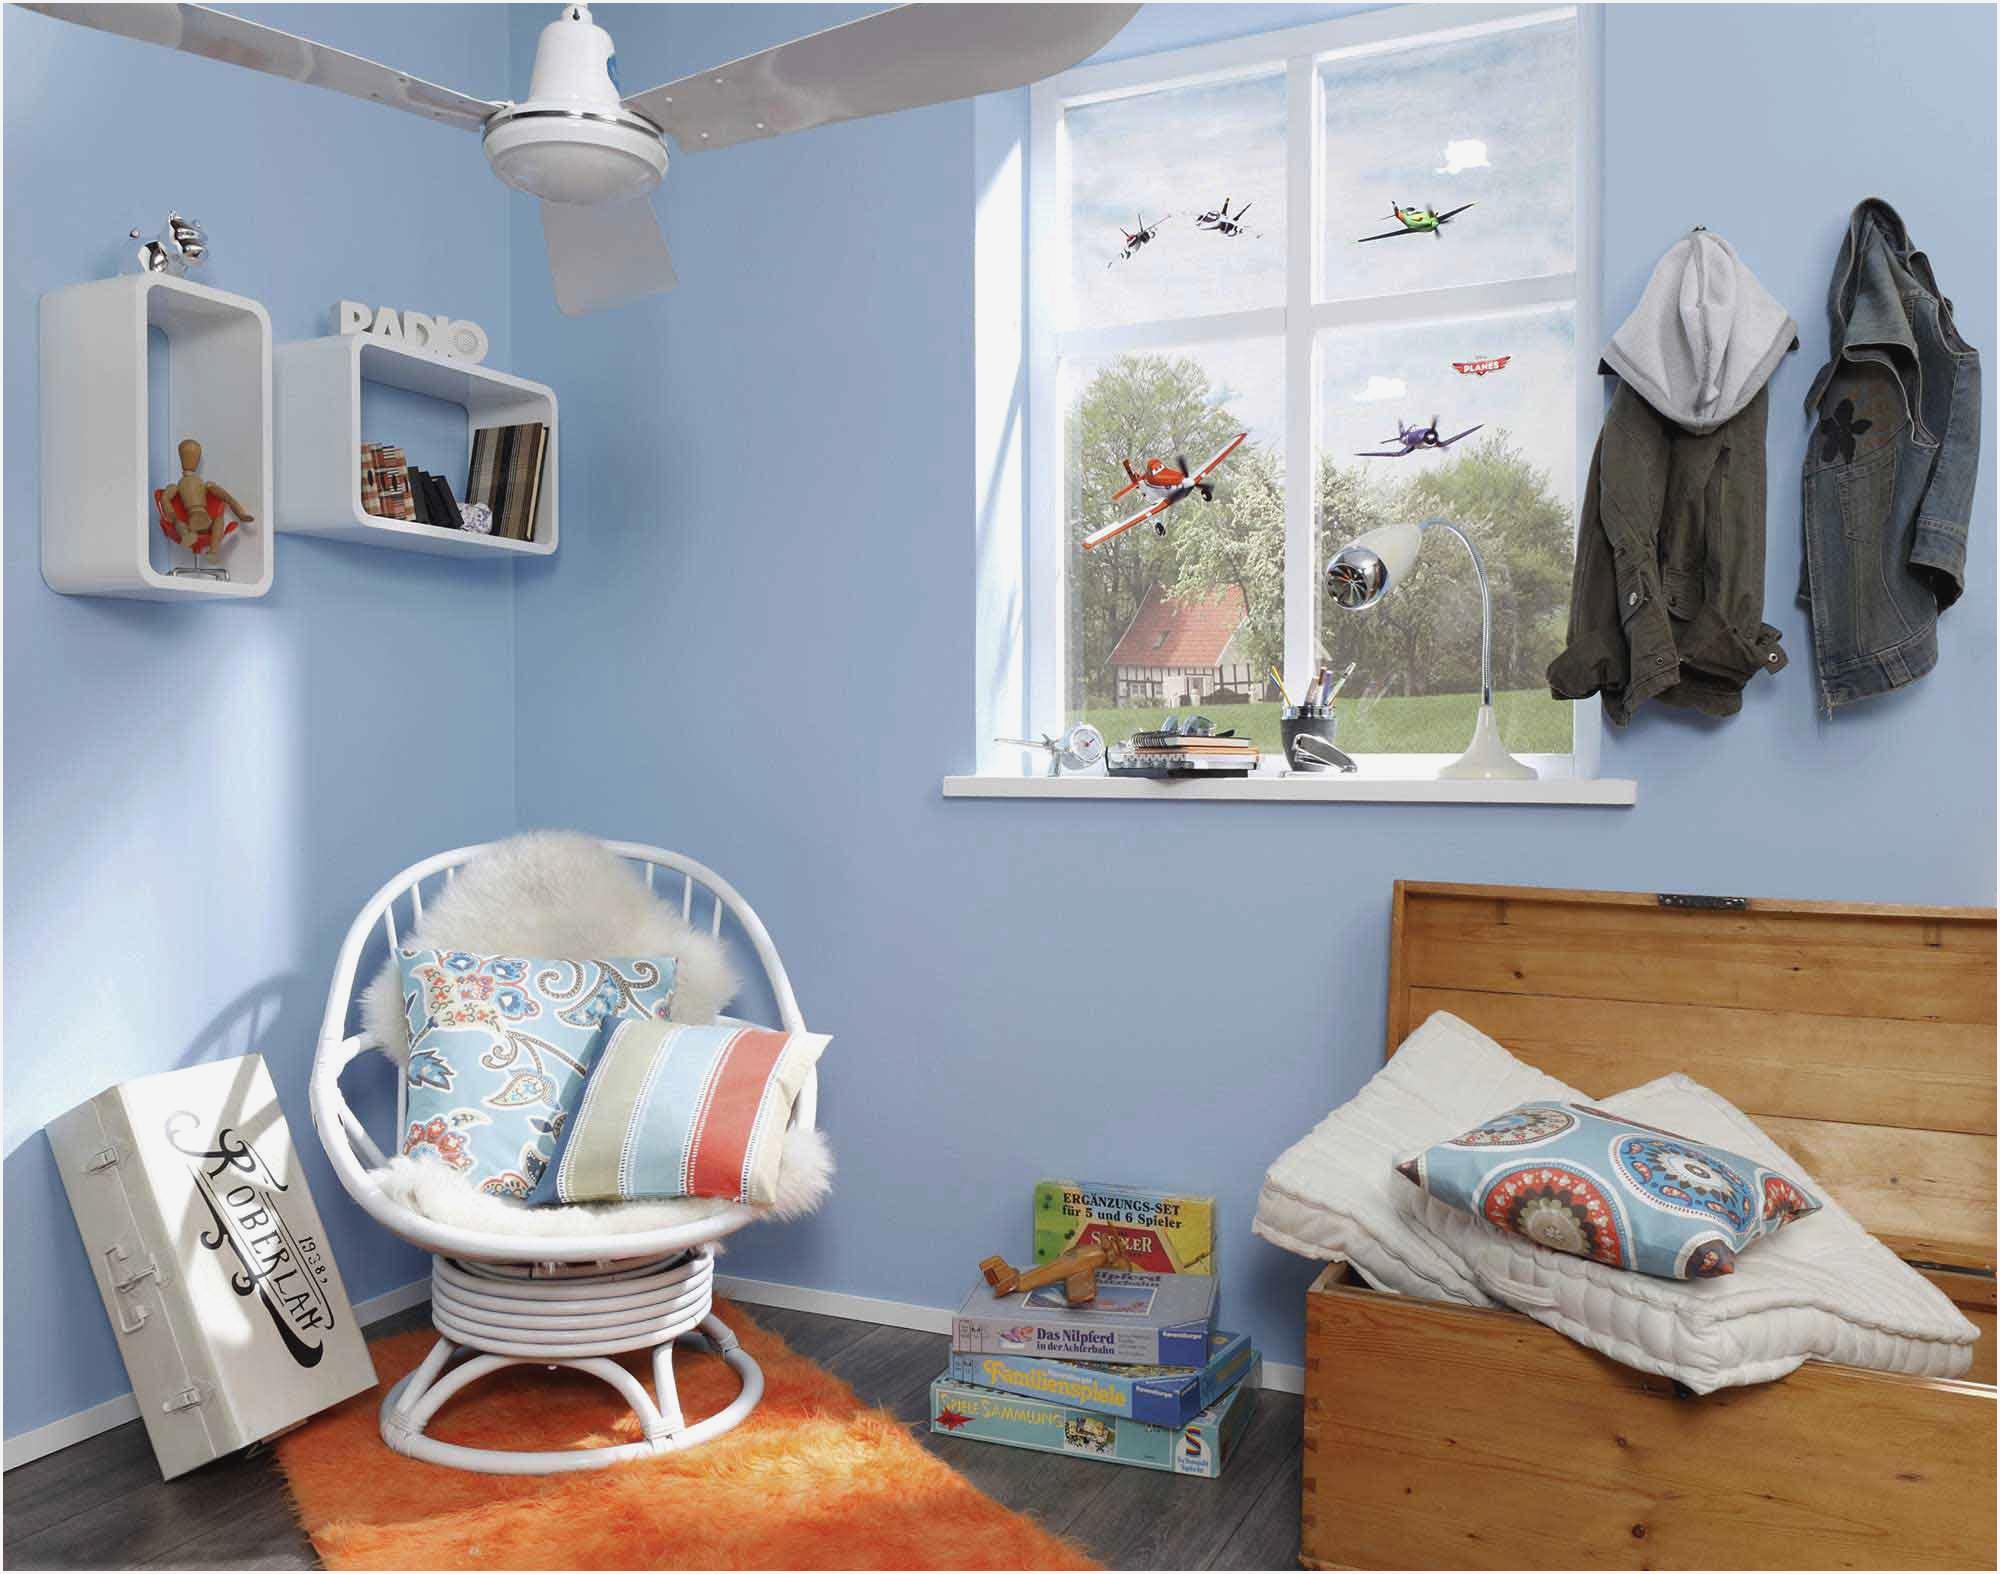 Full Size of Wandsticker Kinderzimmer Junge Jungen Regal Weiß Regale Küche Sofa Kinderzimmer Wandsticker Kinderzimmer Junge